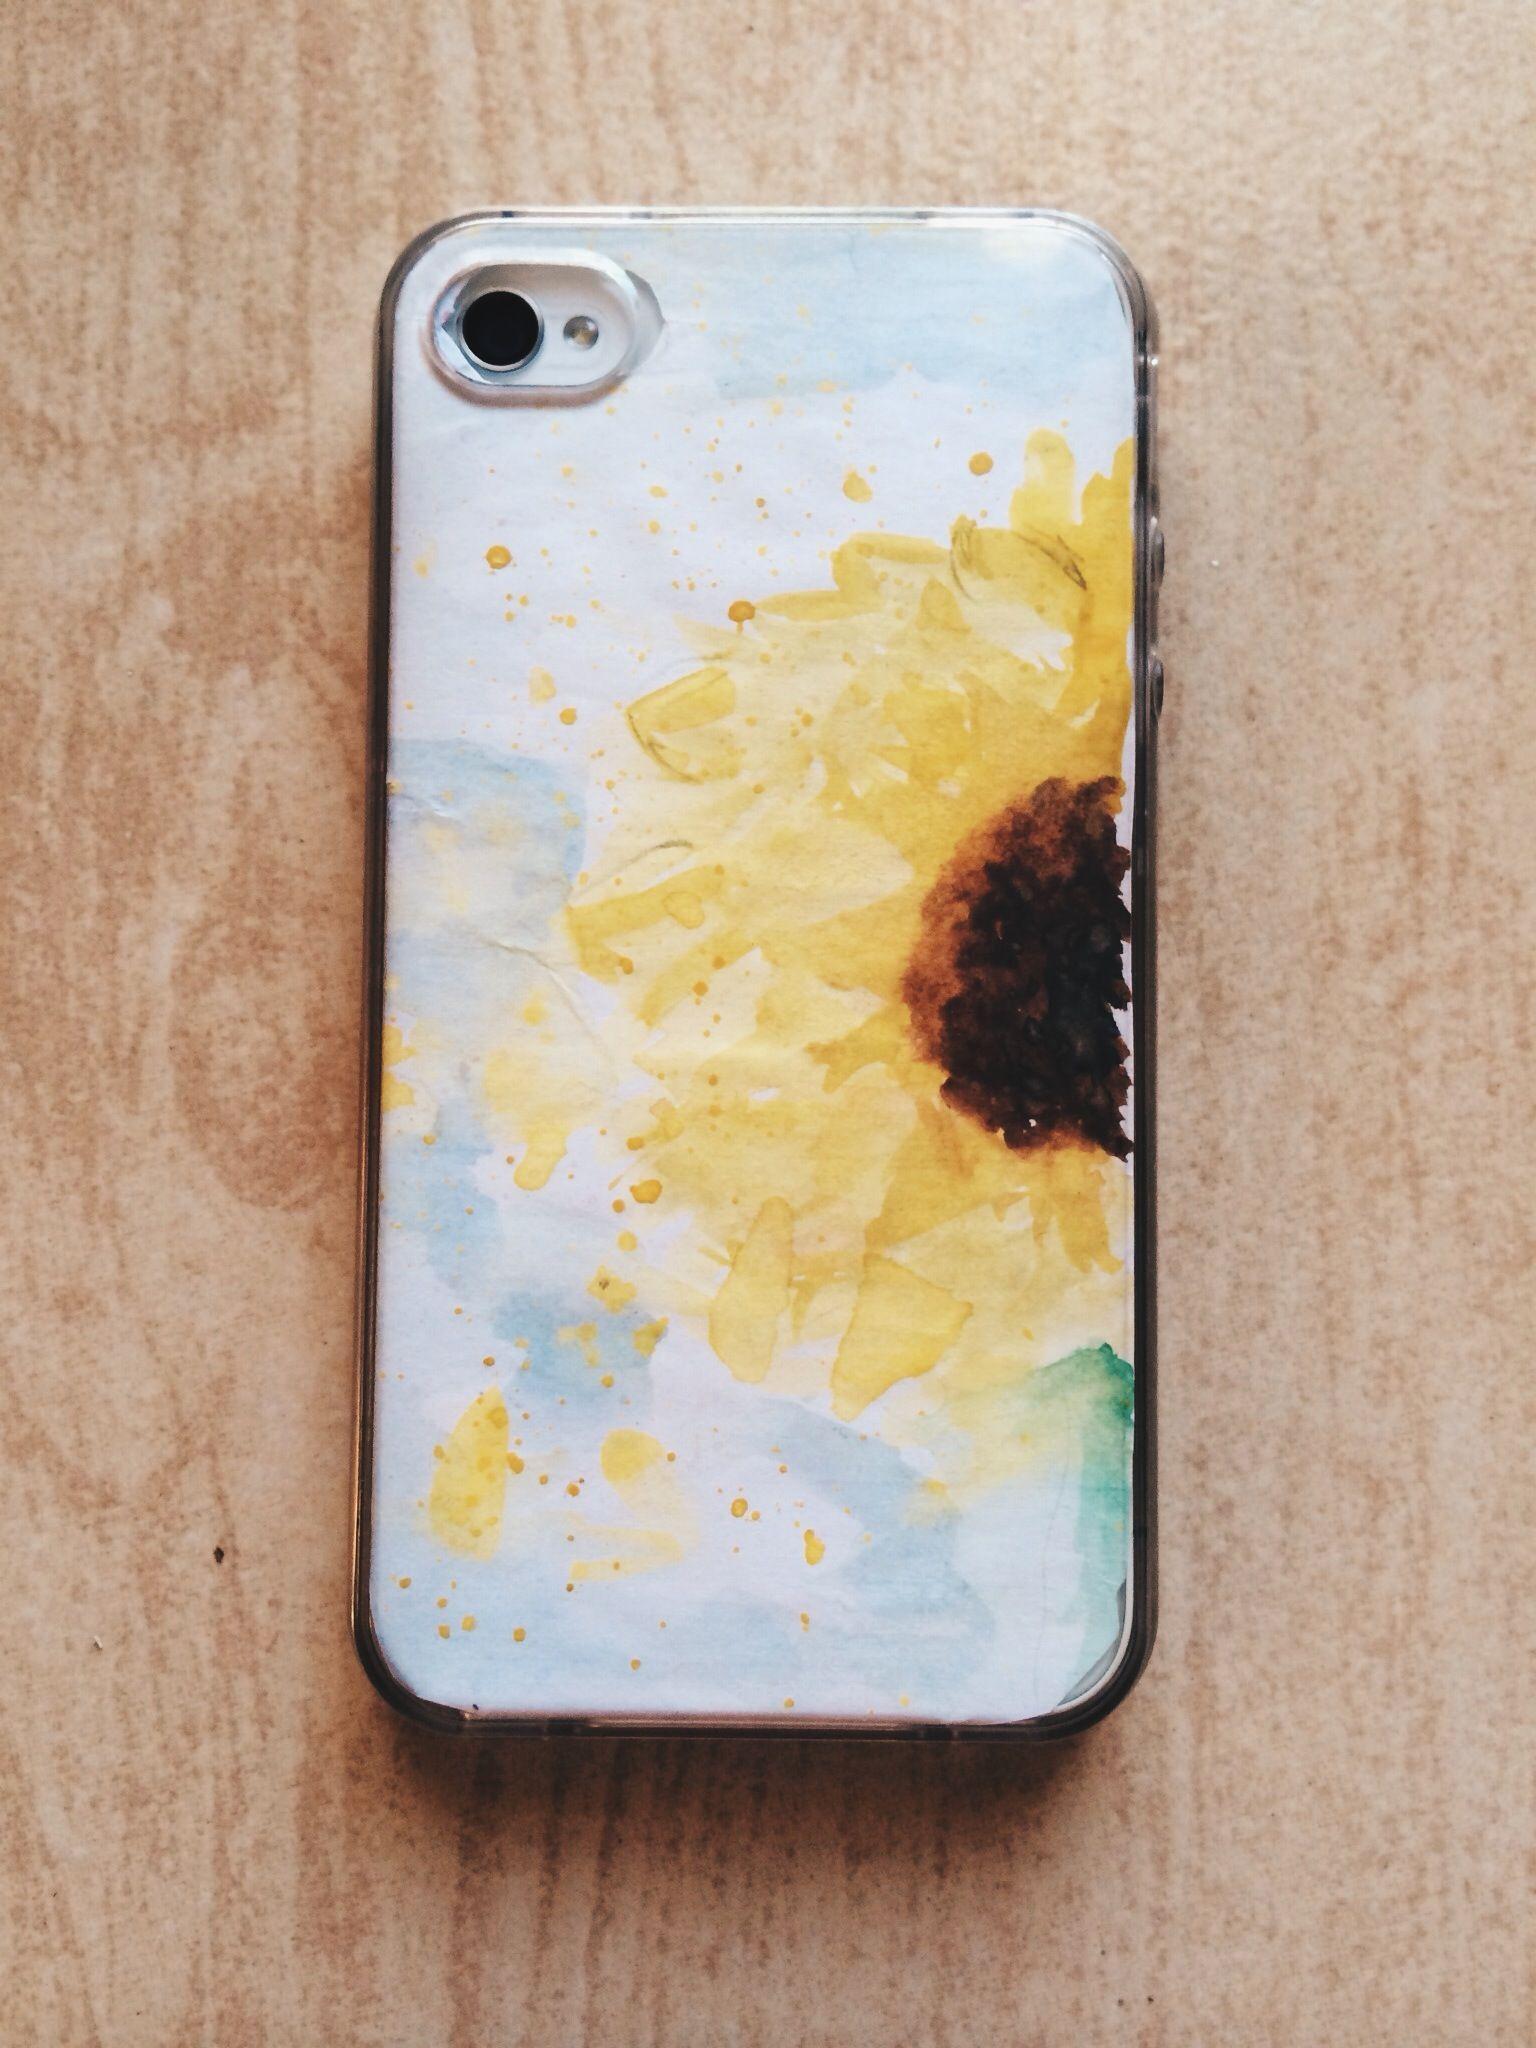 Chic Diy Phone Case Diy Phone Case Design Homemade Phone Cases